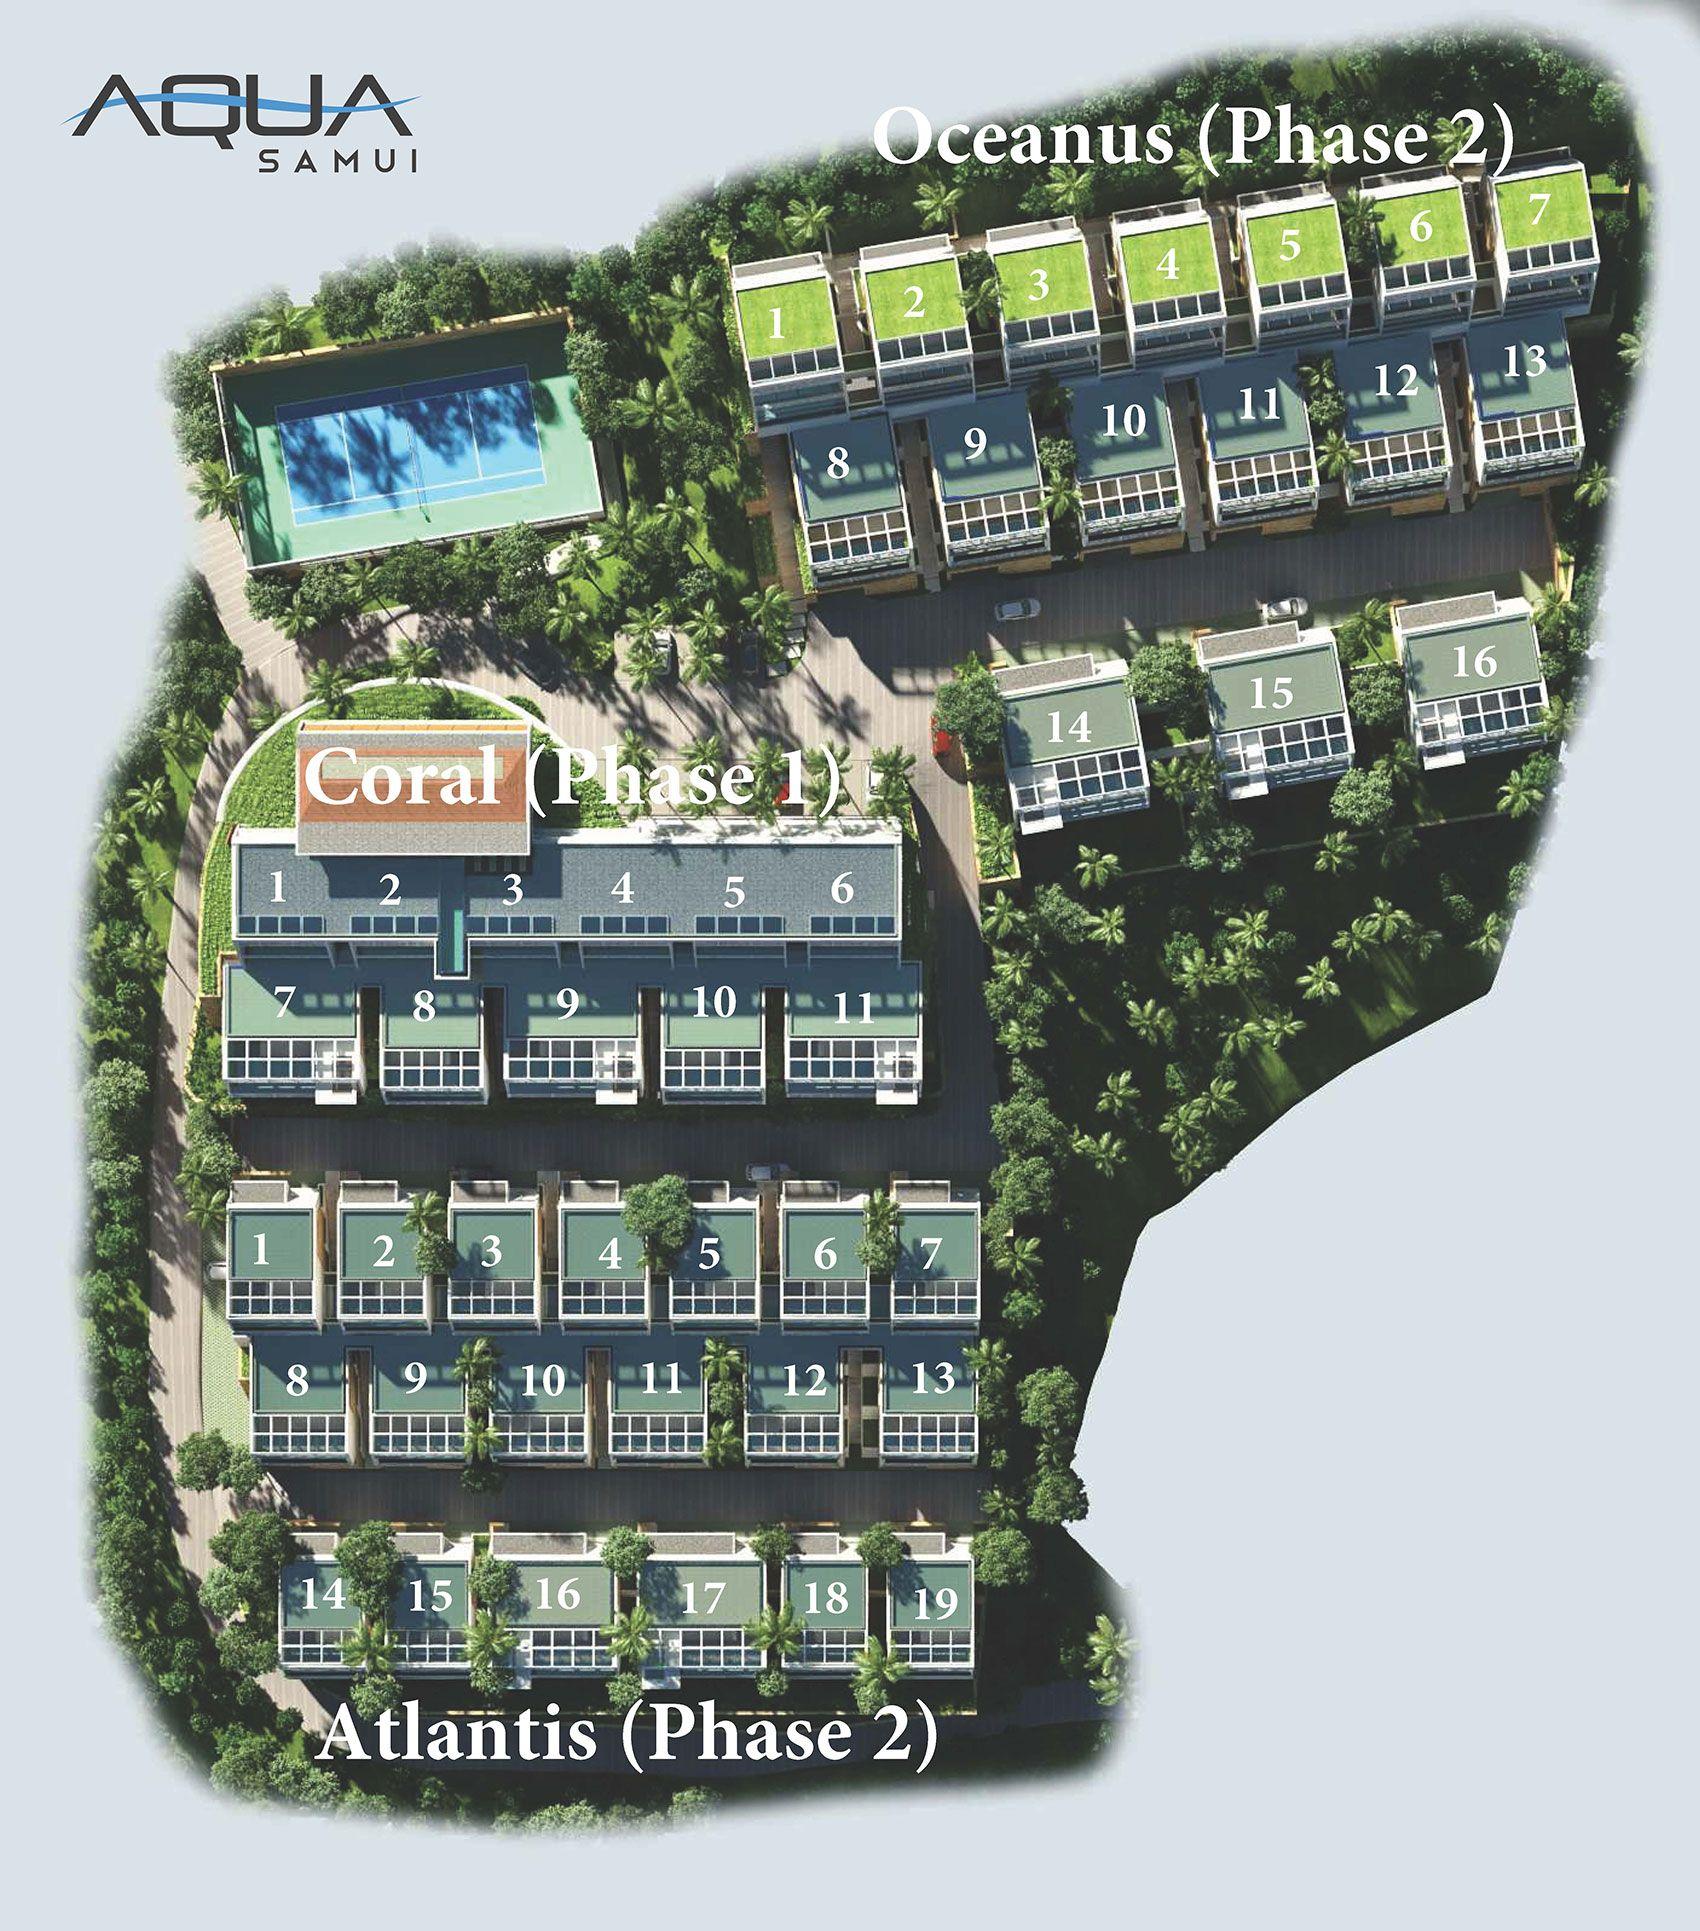 Aqua Samui Is An Ultra Modern Luxury Villa Development By Luxury Living A Leading Real Estate Developer Located On The Island Of Koh Yesil Mimari Mimari Yesil